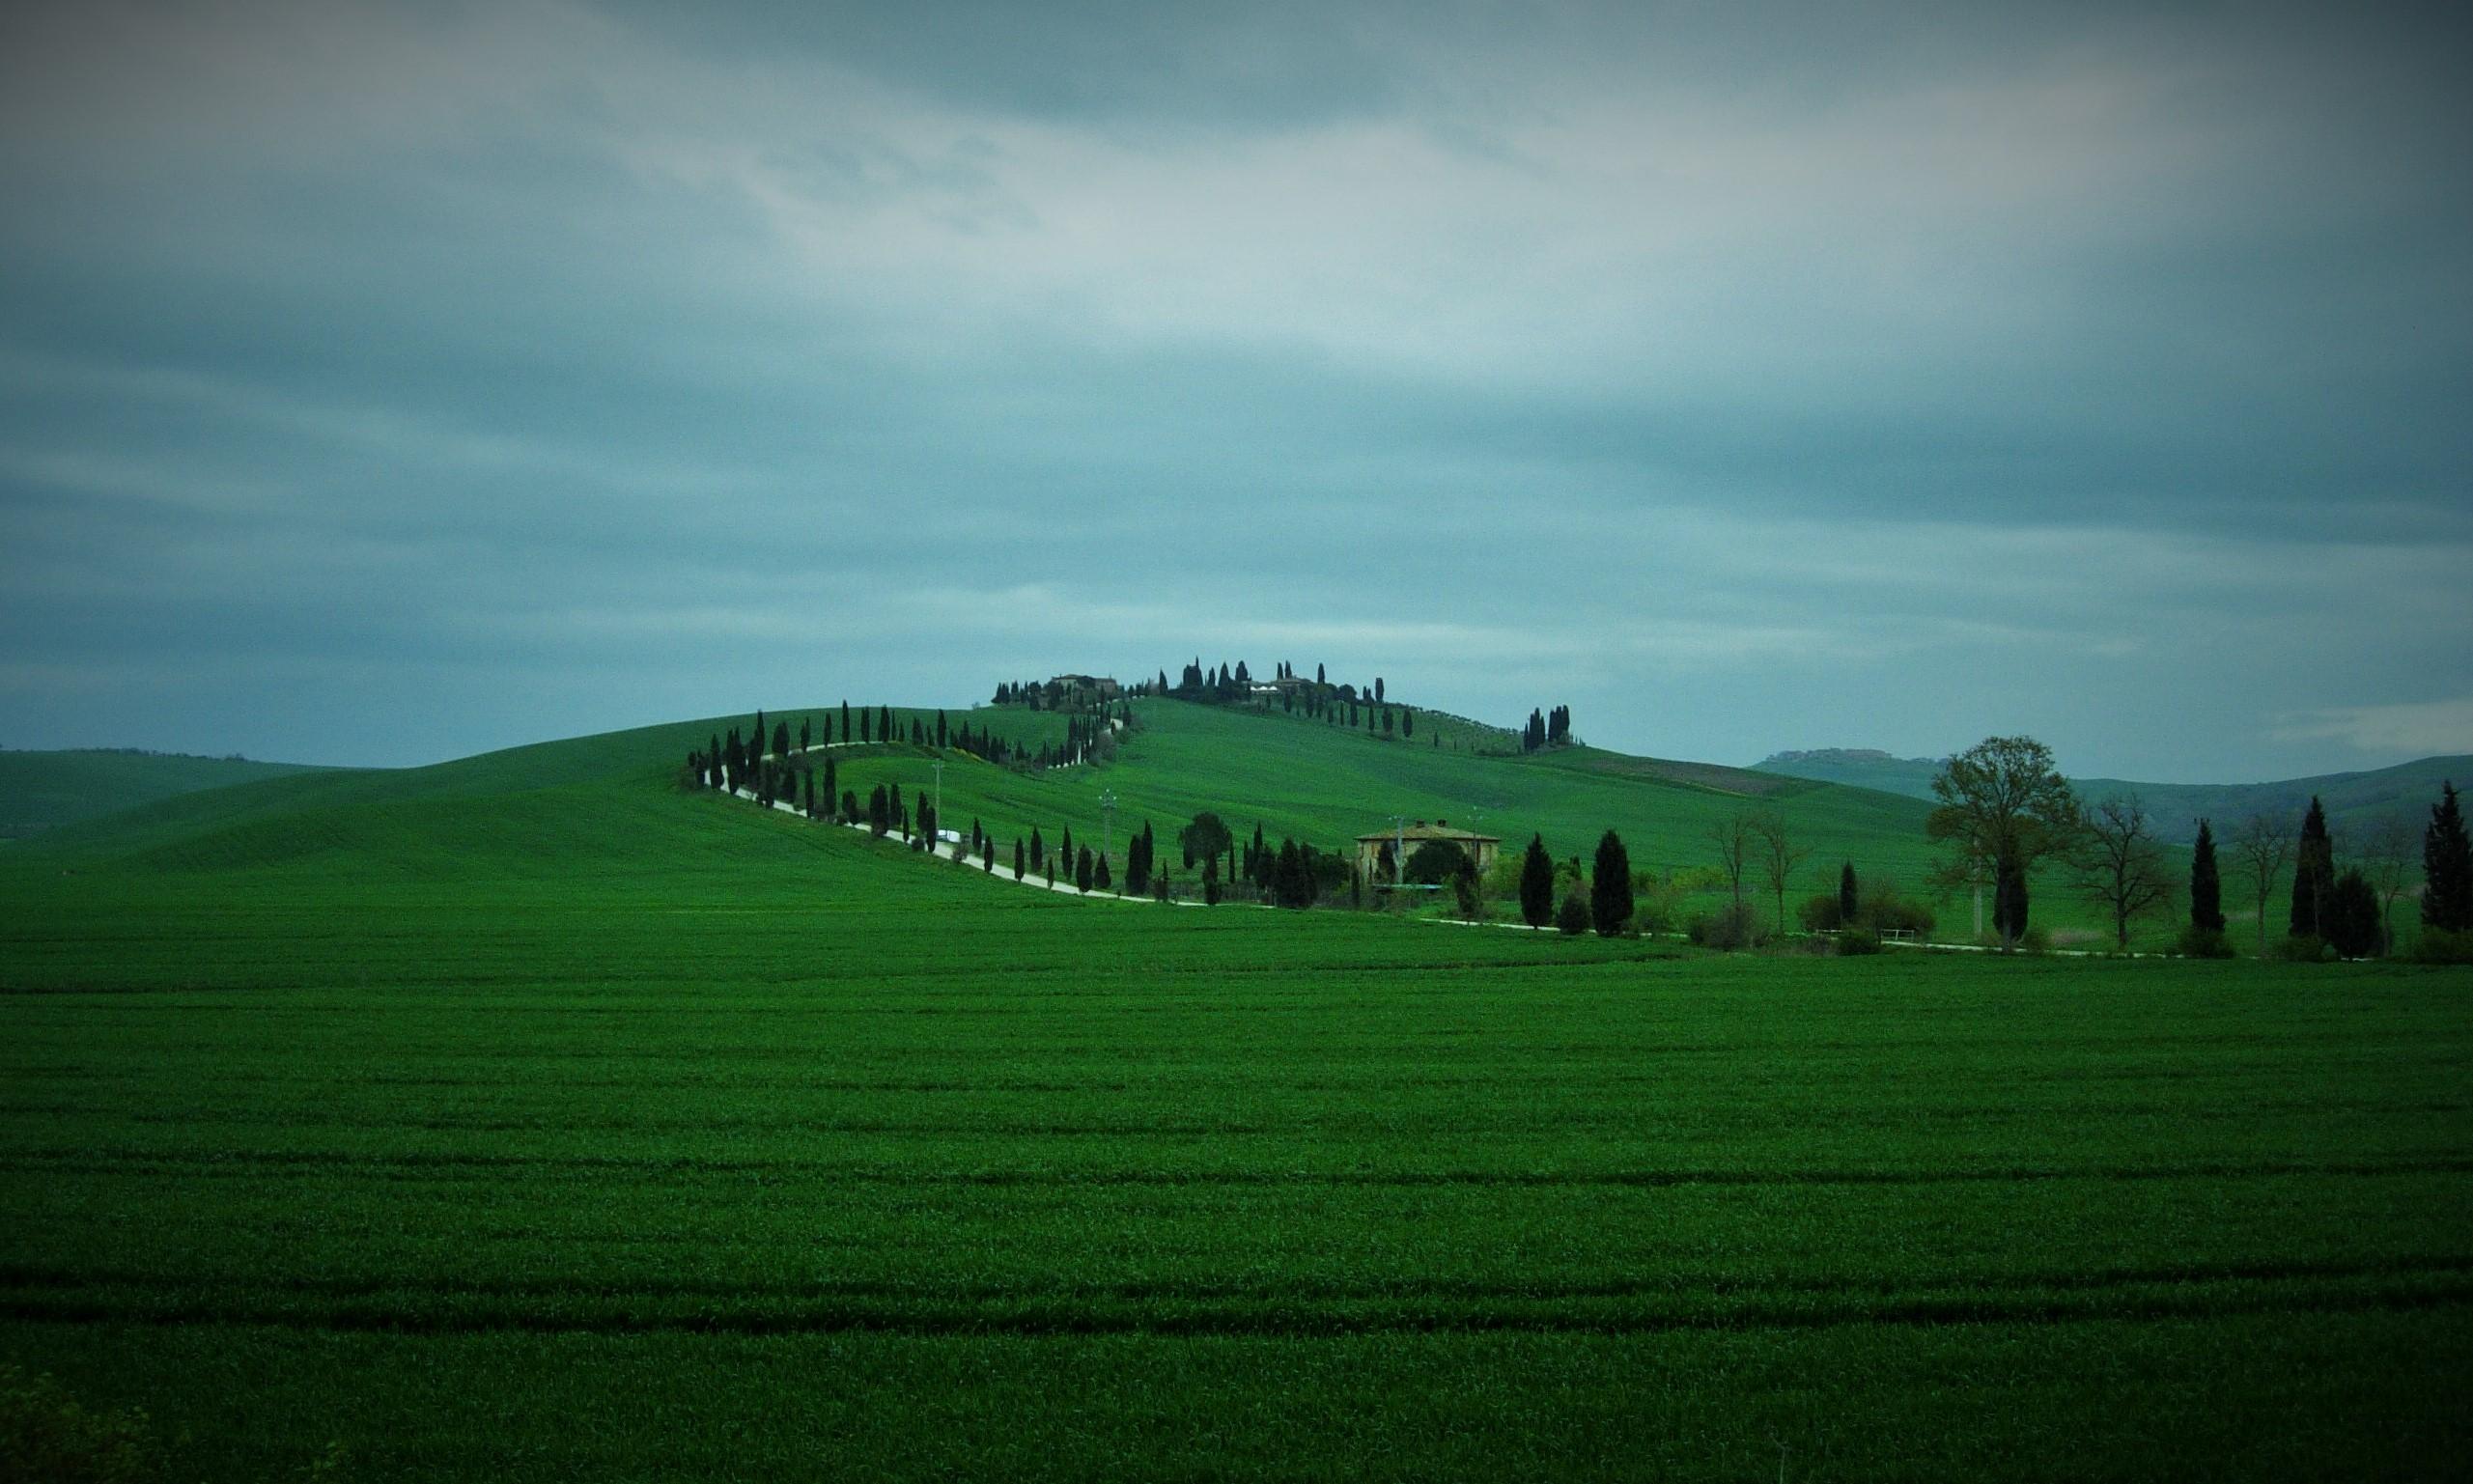 Tuscany - Hills